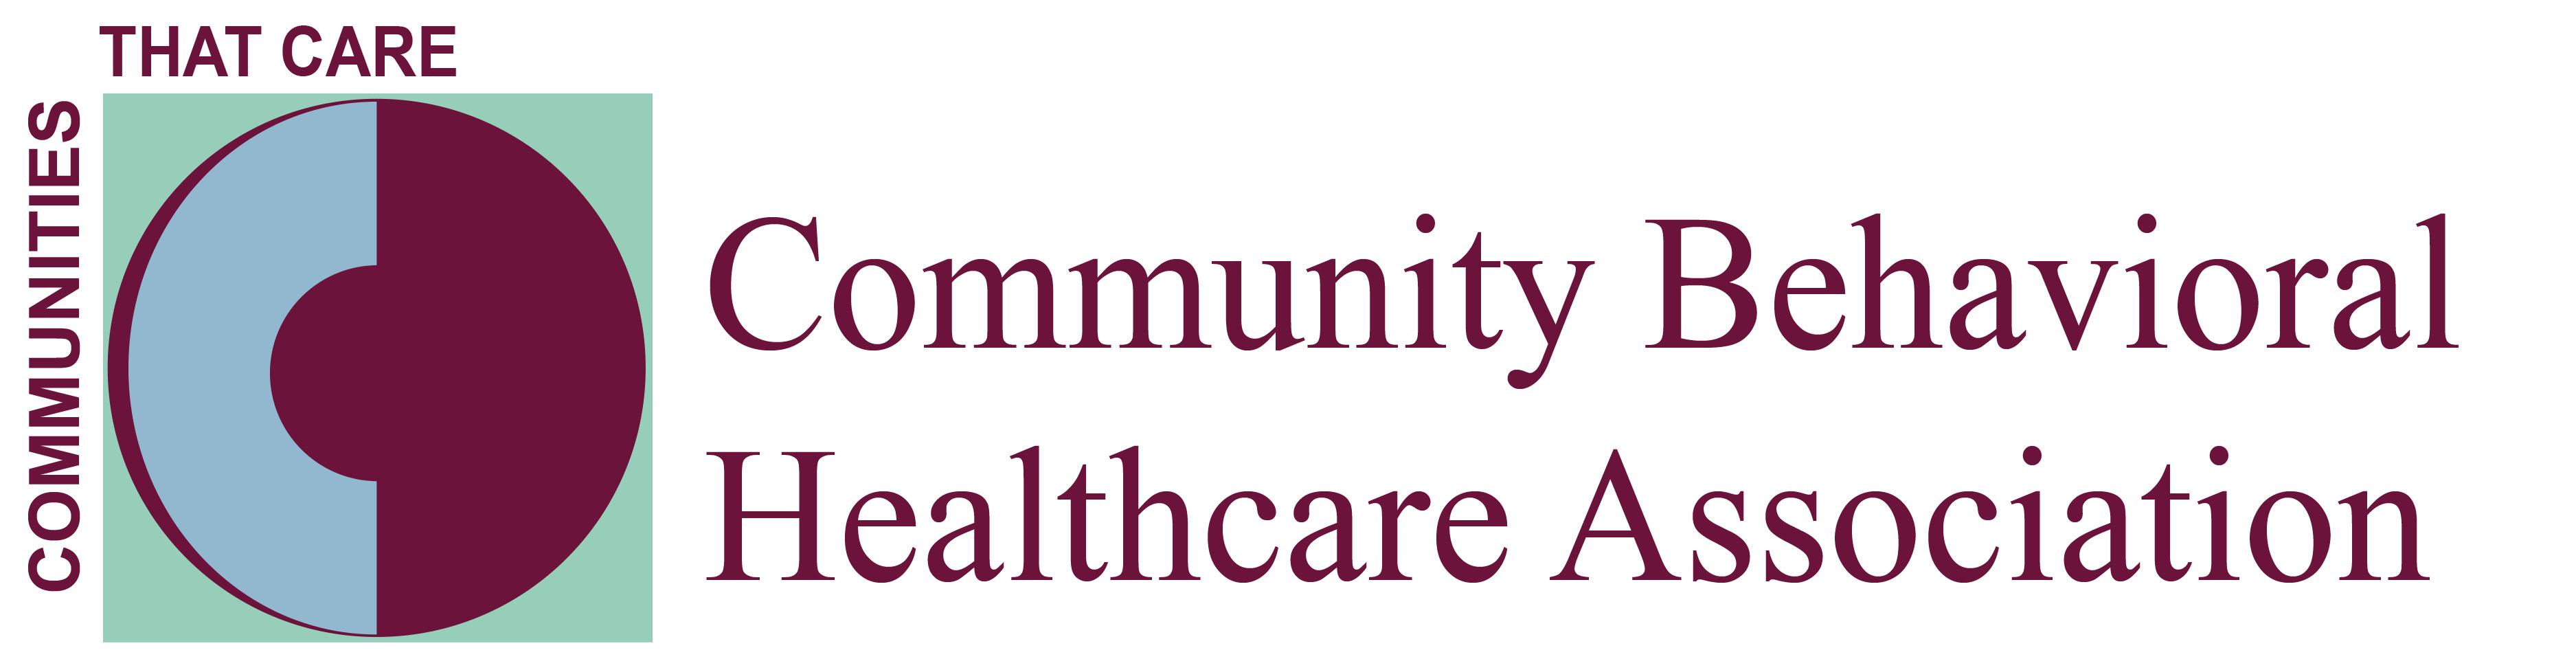 Community Behavioral Healthcare Association